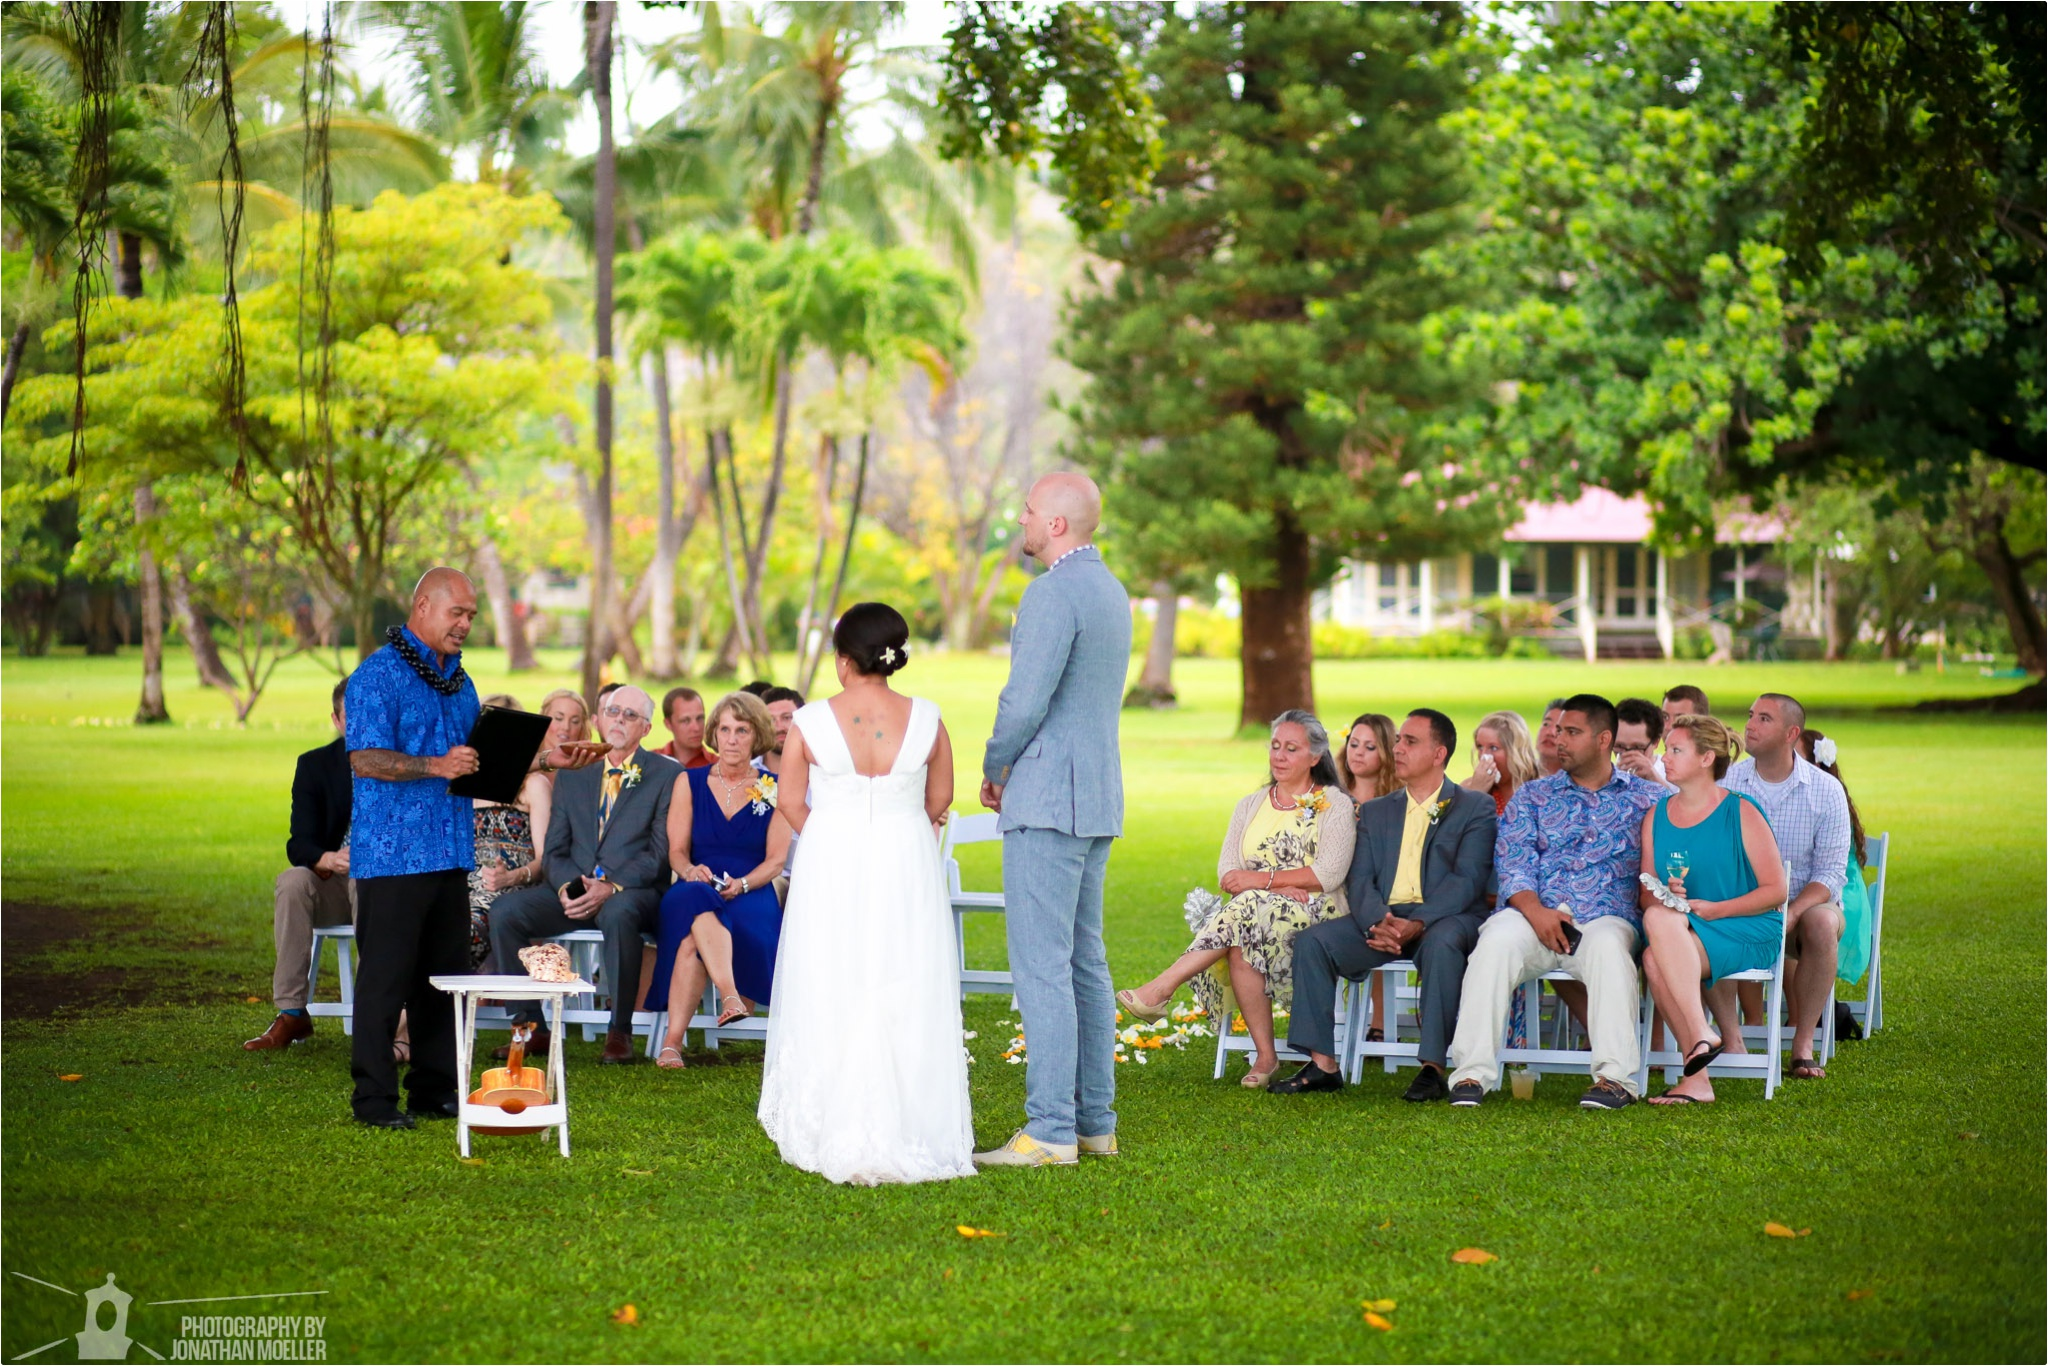 jonathan-moeller-photographer-wedding-photography-kauai-hawaii-kalihiwai-ridge-valley-estate-_0211